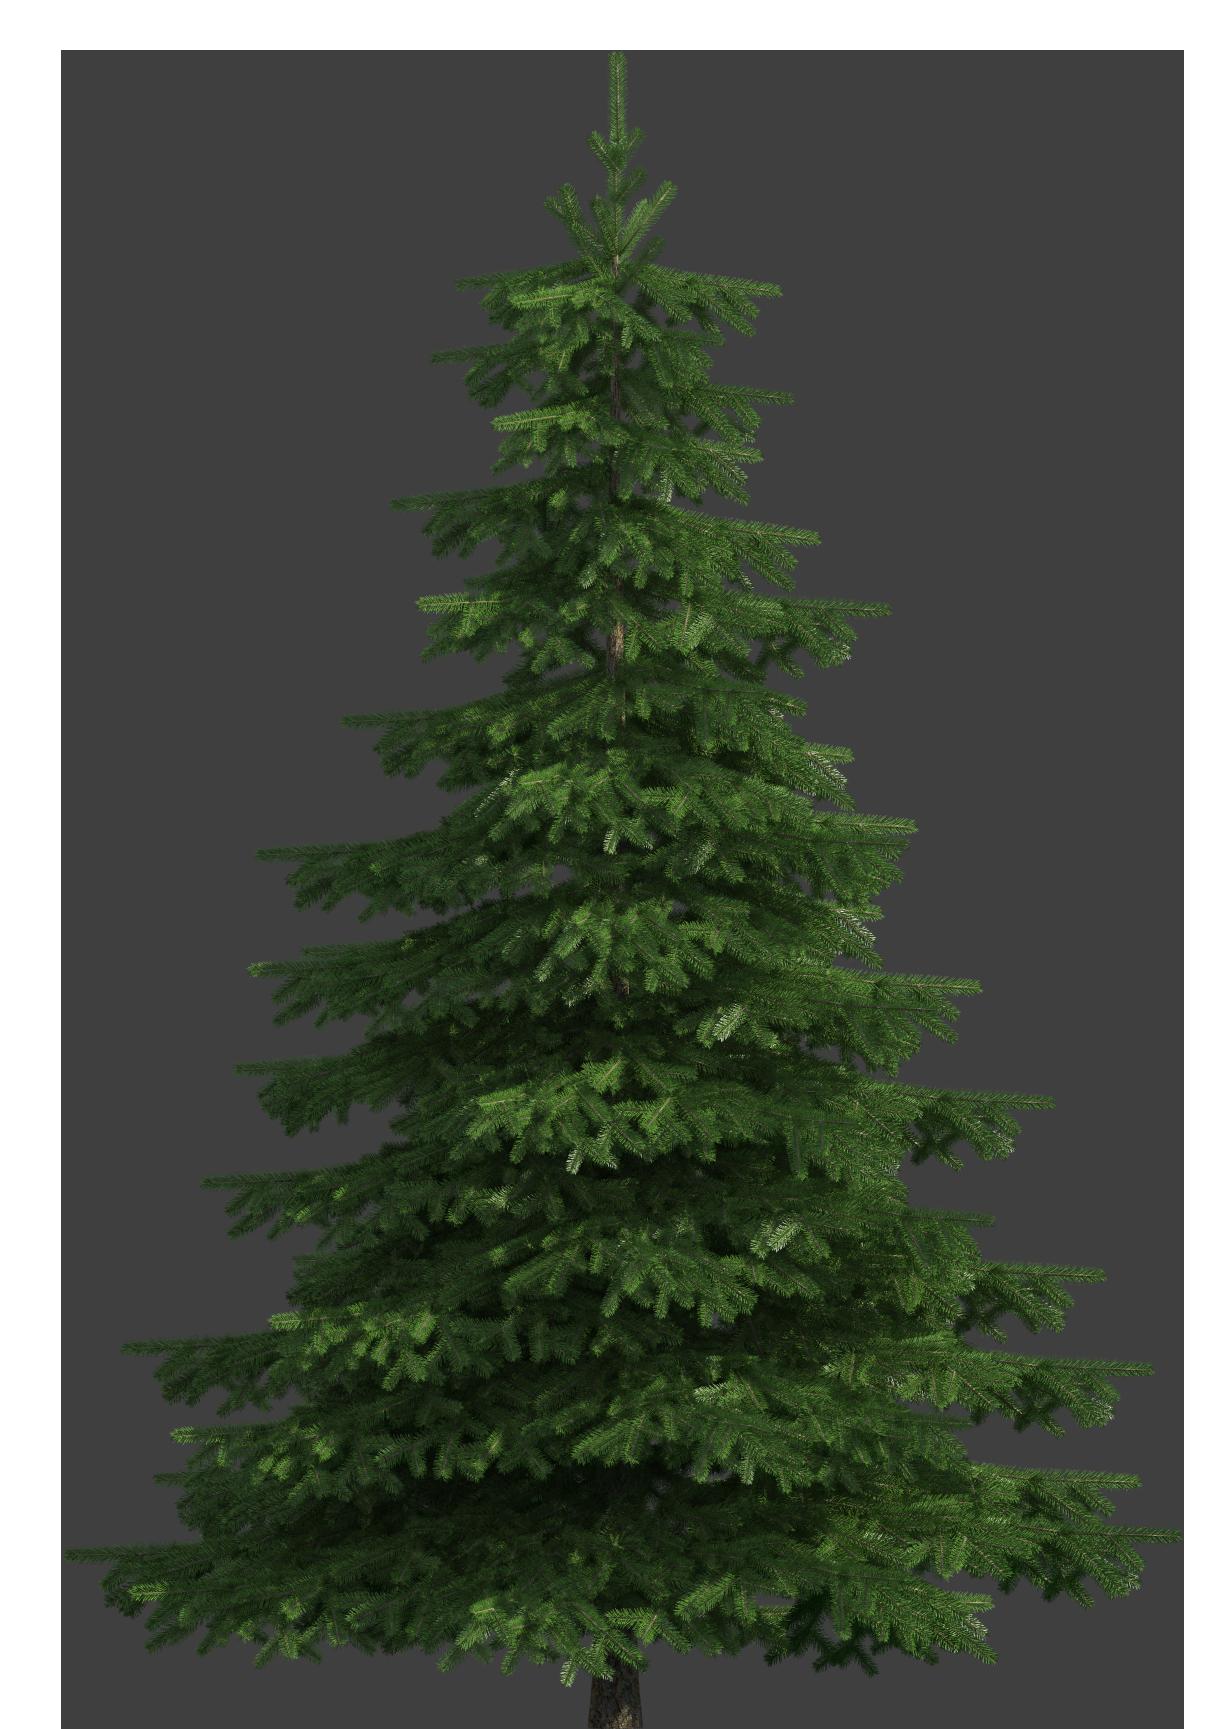 Realistic pine tree png. Pinecone clipart gymnosperm